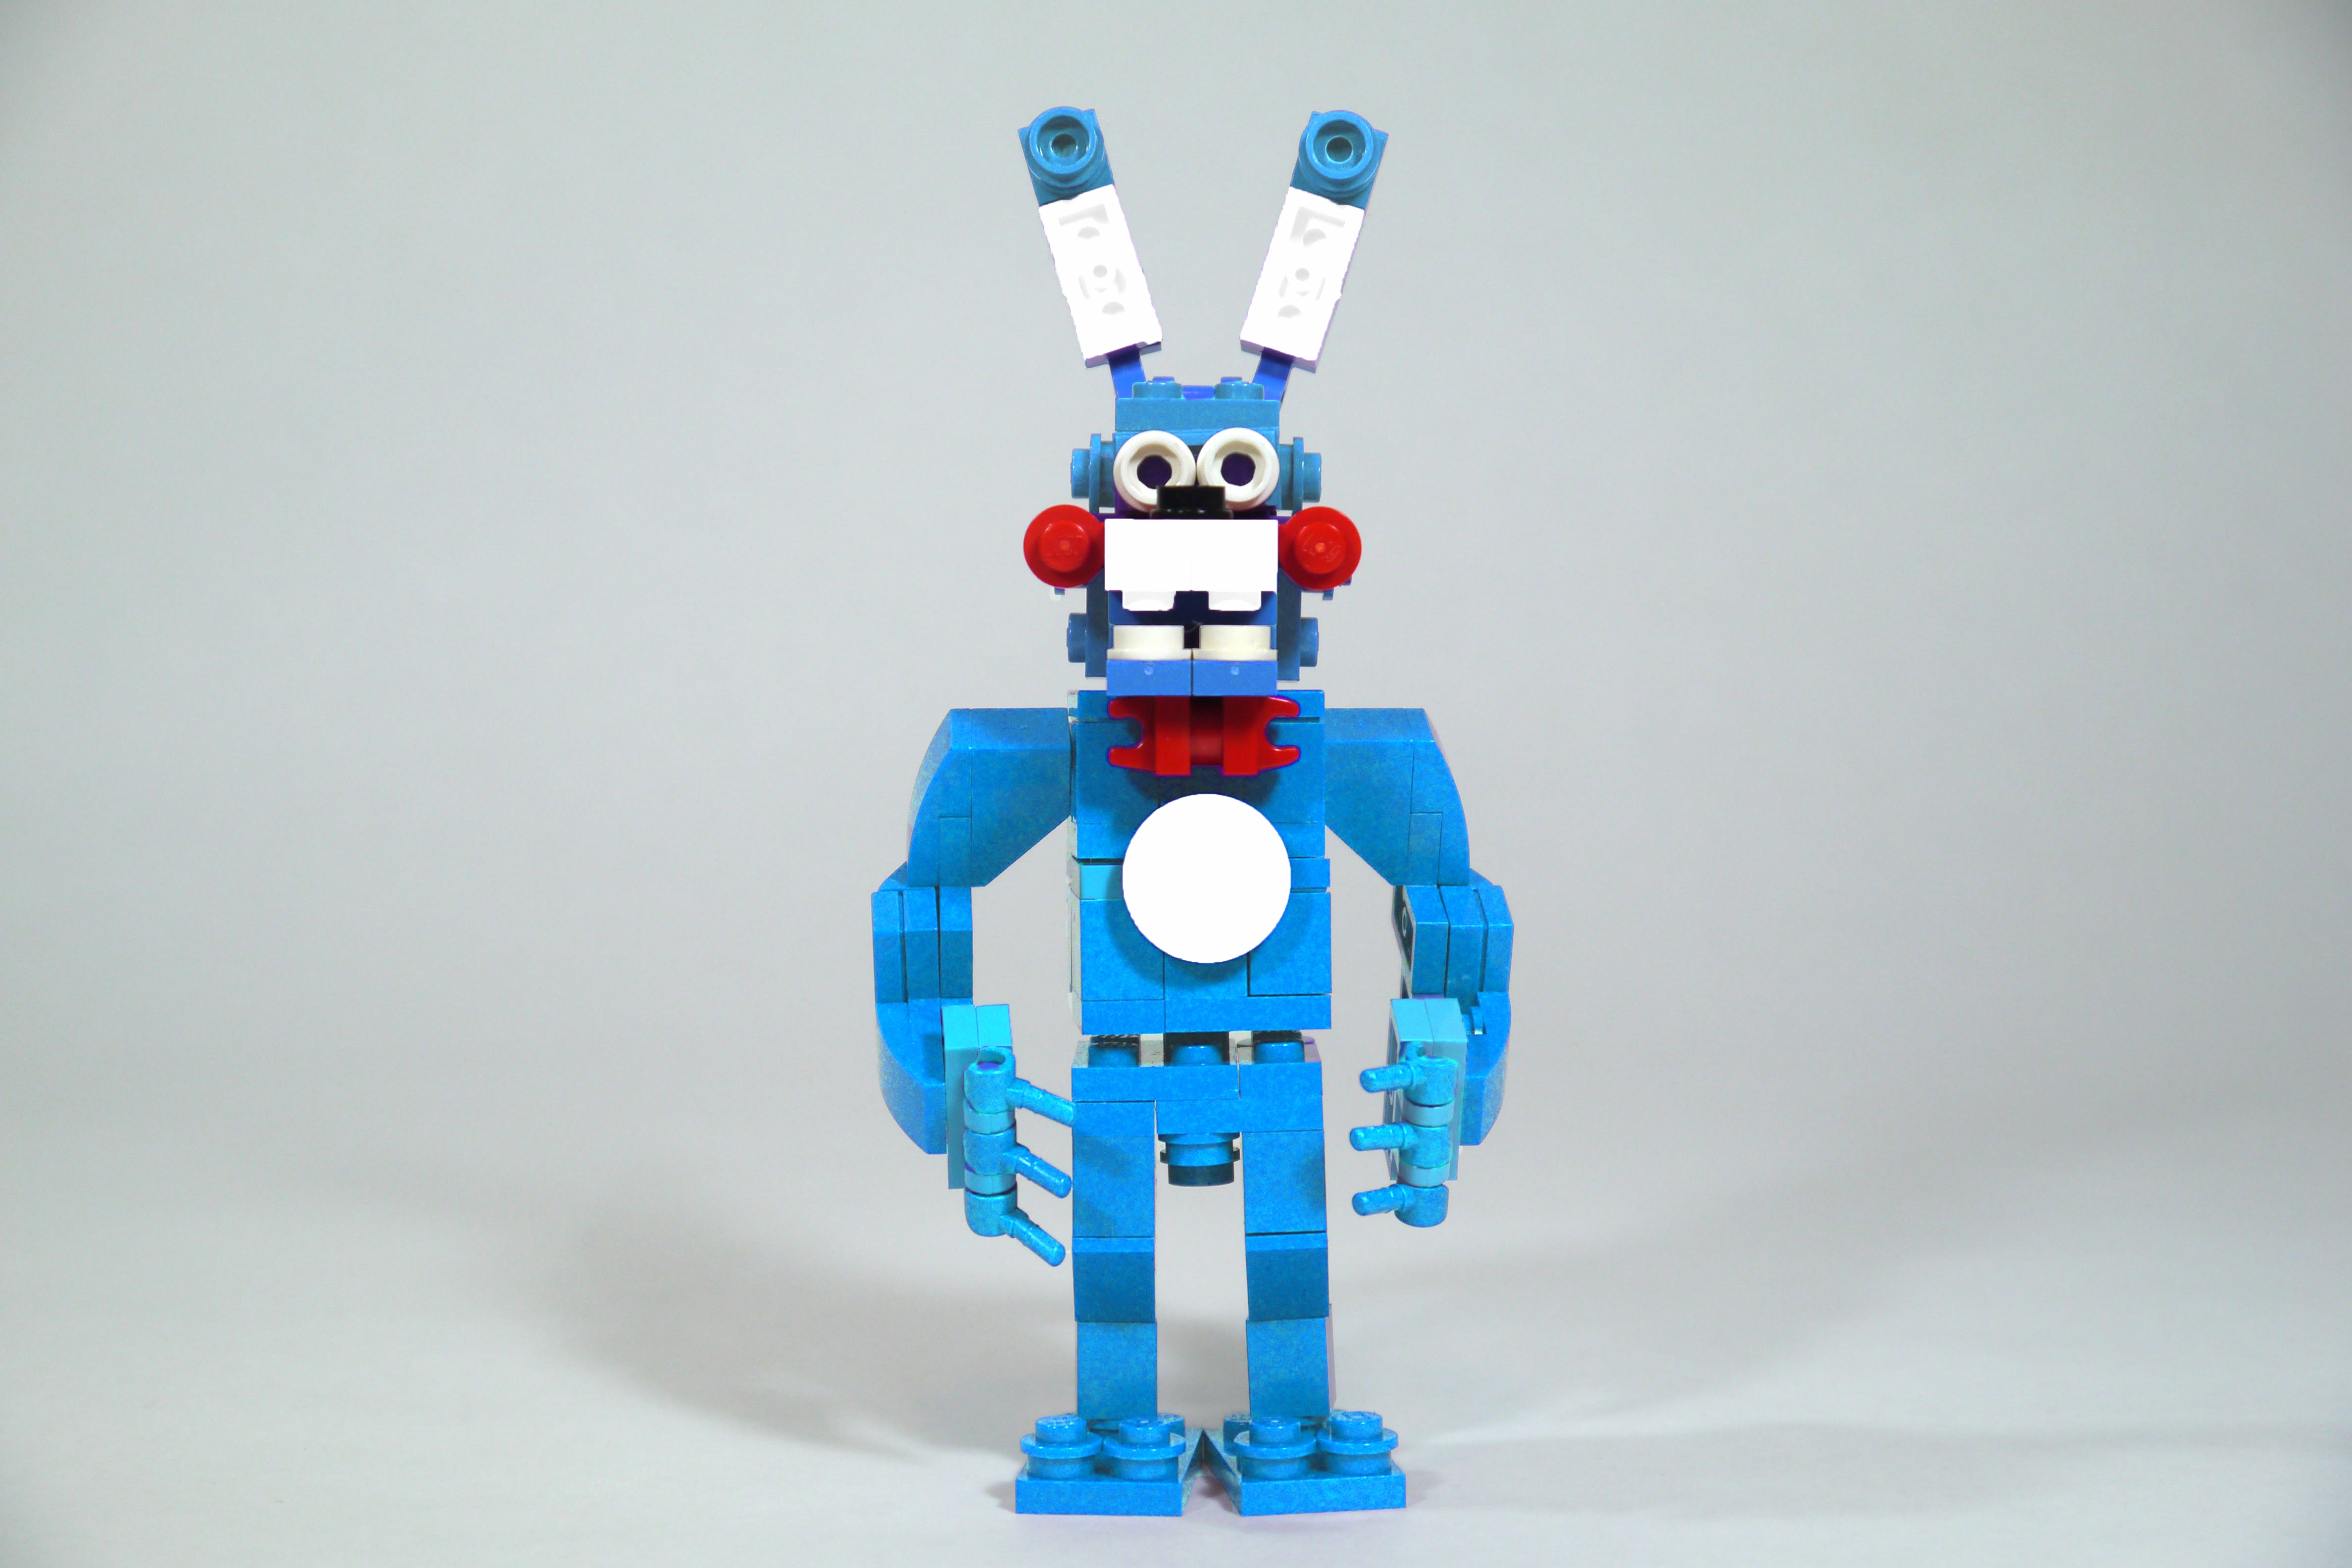 Lego fnaf toy bonnie photoshopped flickr photo sharing